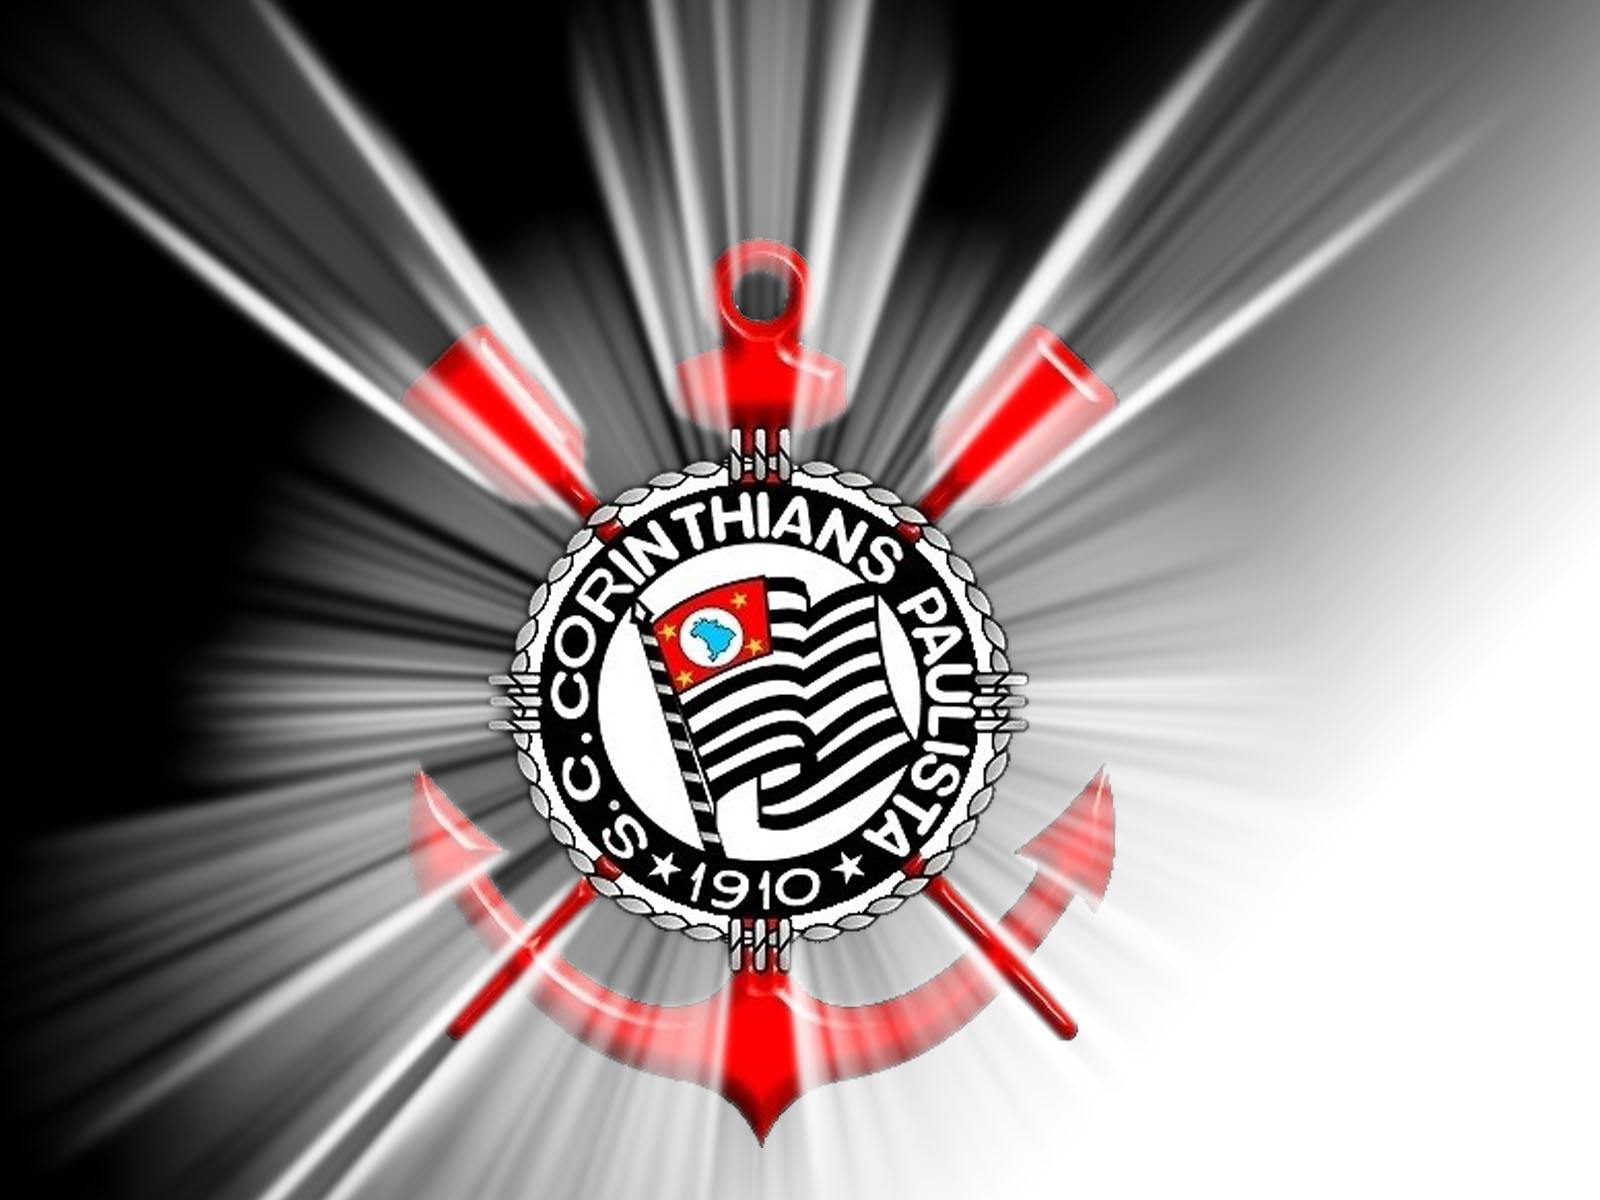 Corinthians 7